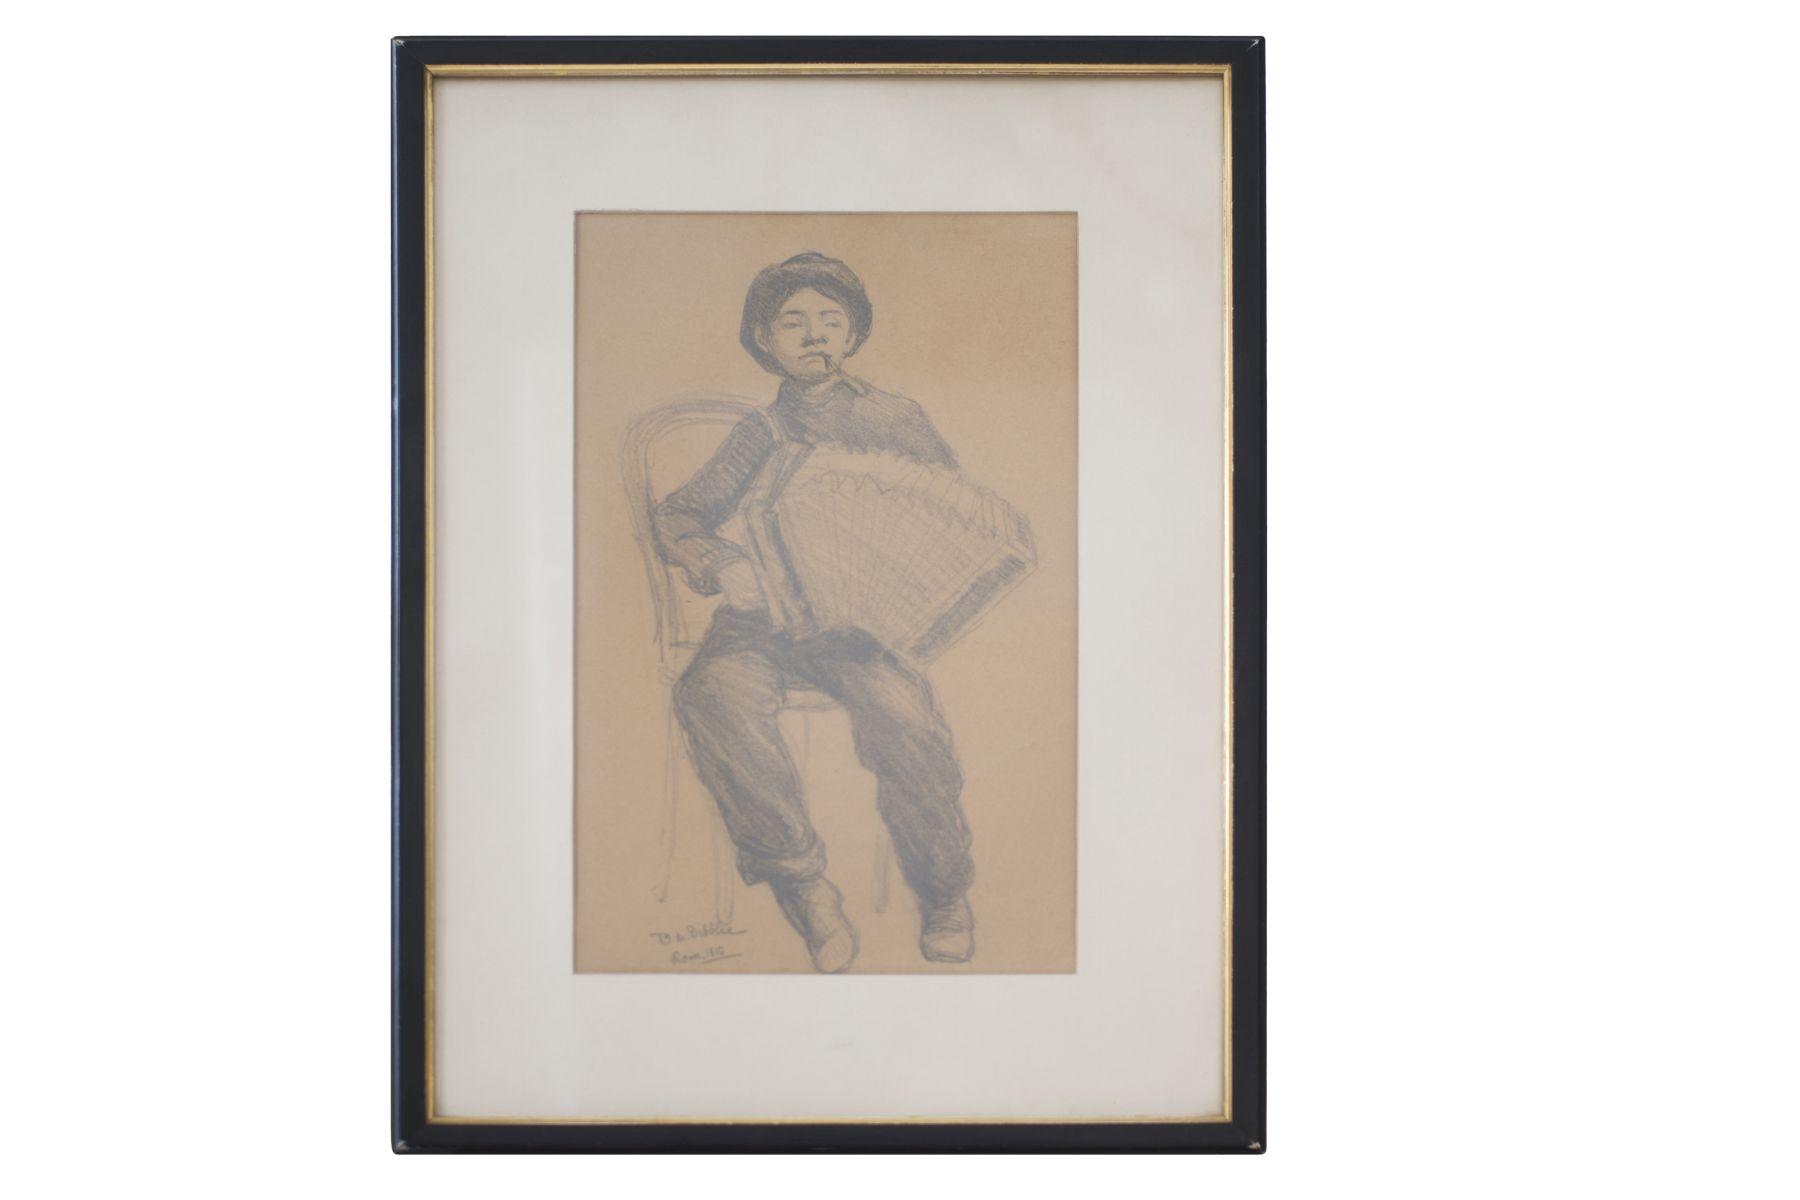 "#29 B.M. Dibbleo Rome 1910 ""Harmonica player"" | B.M. Dibbleo Rom 1910 ""Harmonikaspieler"" Image"